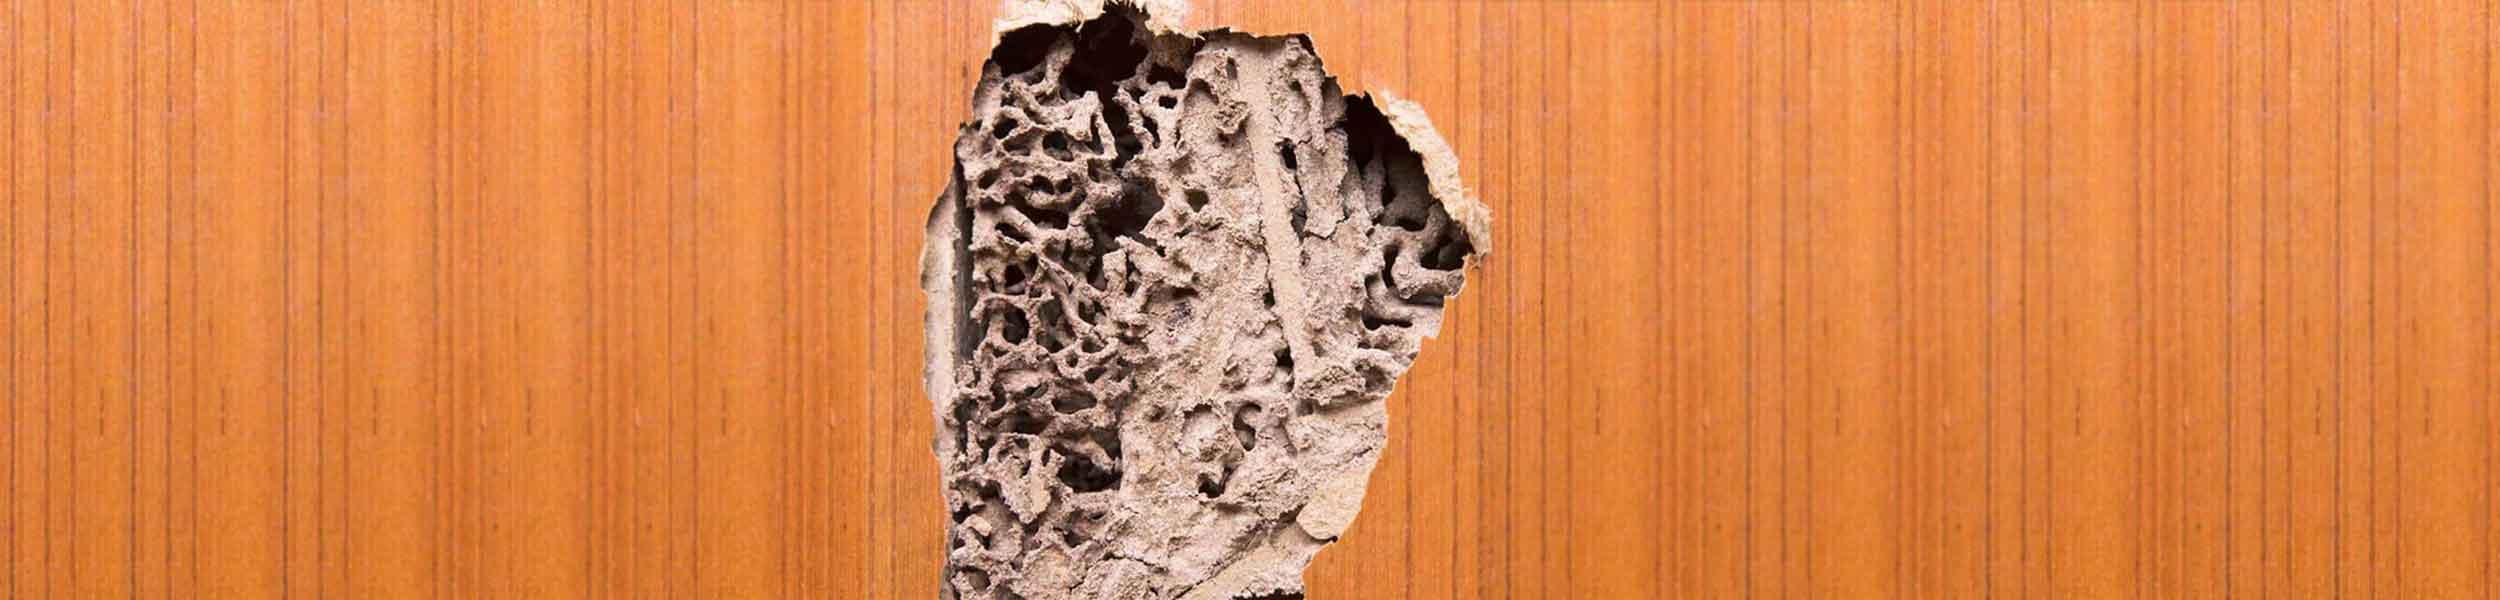 ACE Exterminating Pest Control - Termite Infestation Damage - Slider